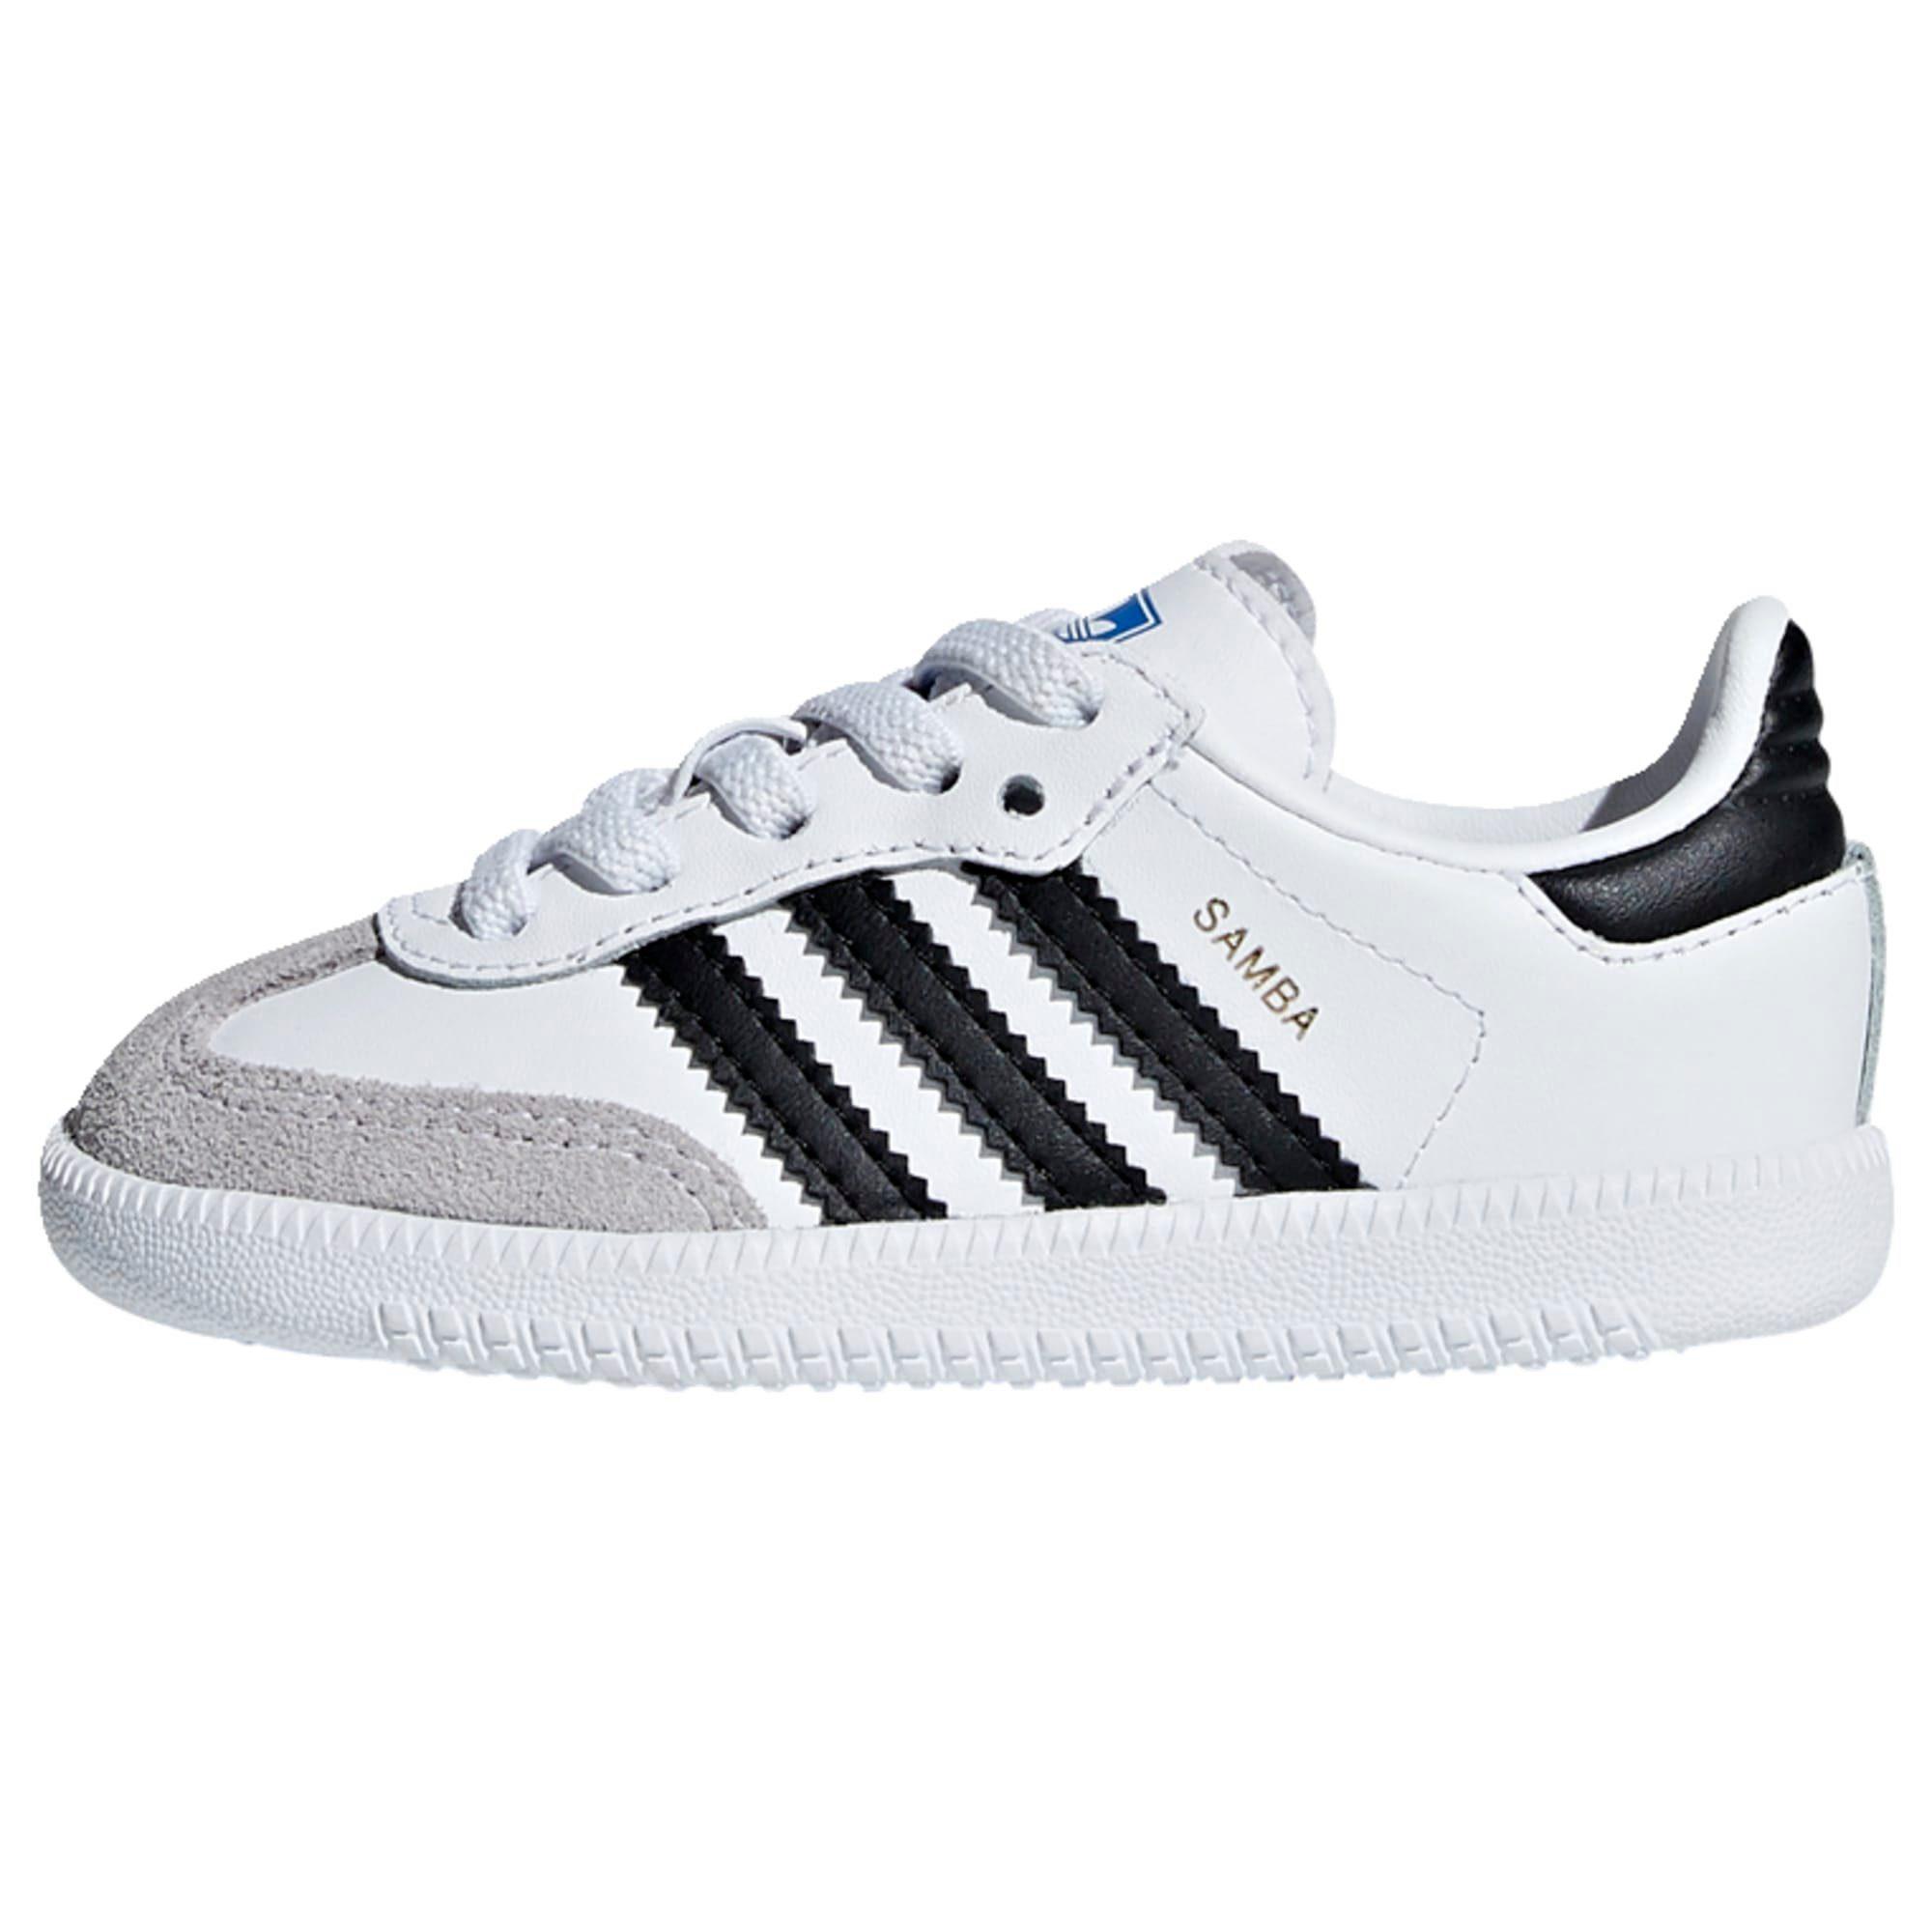 Samba;trefoil;classics Sneaker Online Adidas Originals Schuh« »samba Og KaufenOtto hQsdCtxBor